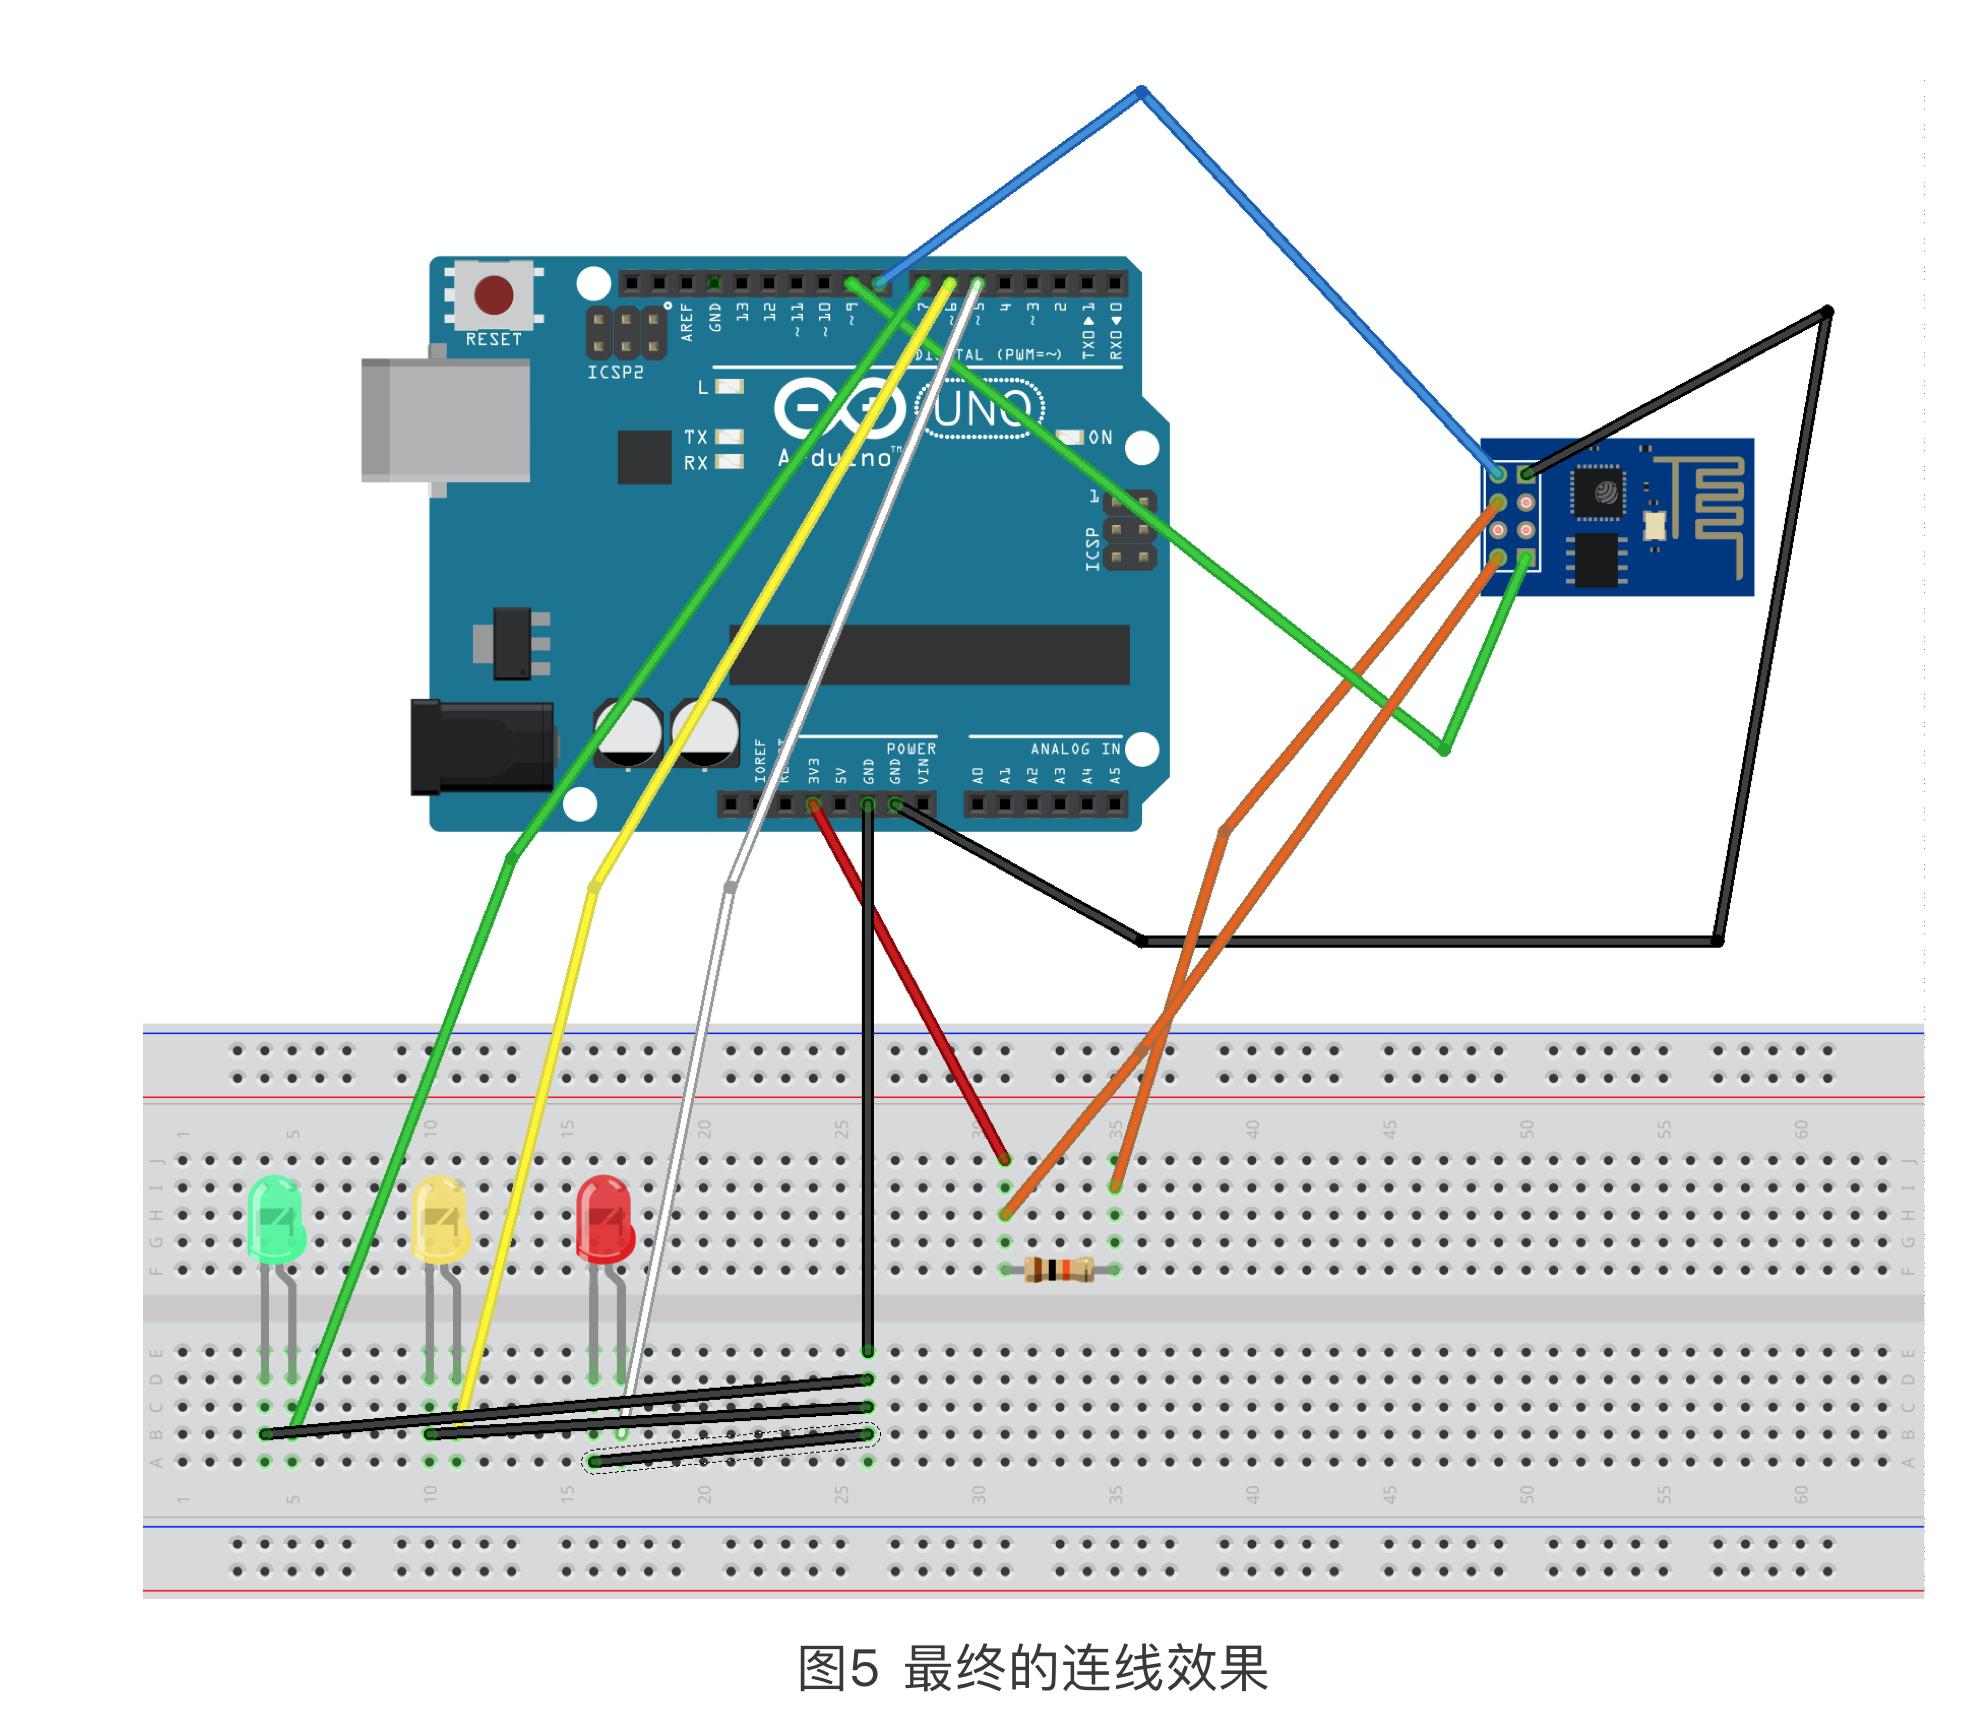 【Arduino实验室】NB的玩法,远程控制交通信号灯-ESP8266联网